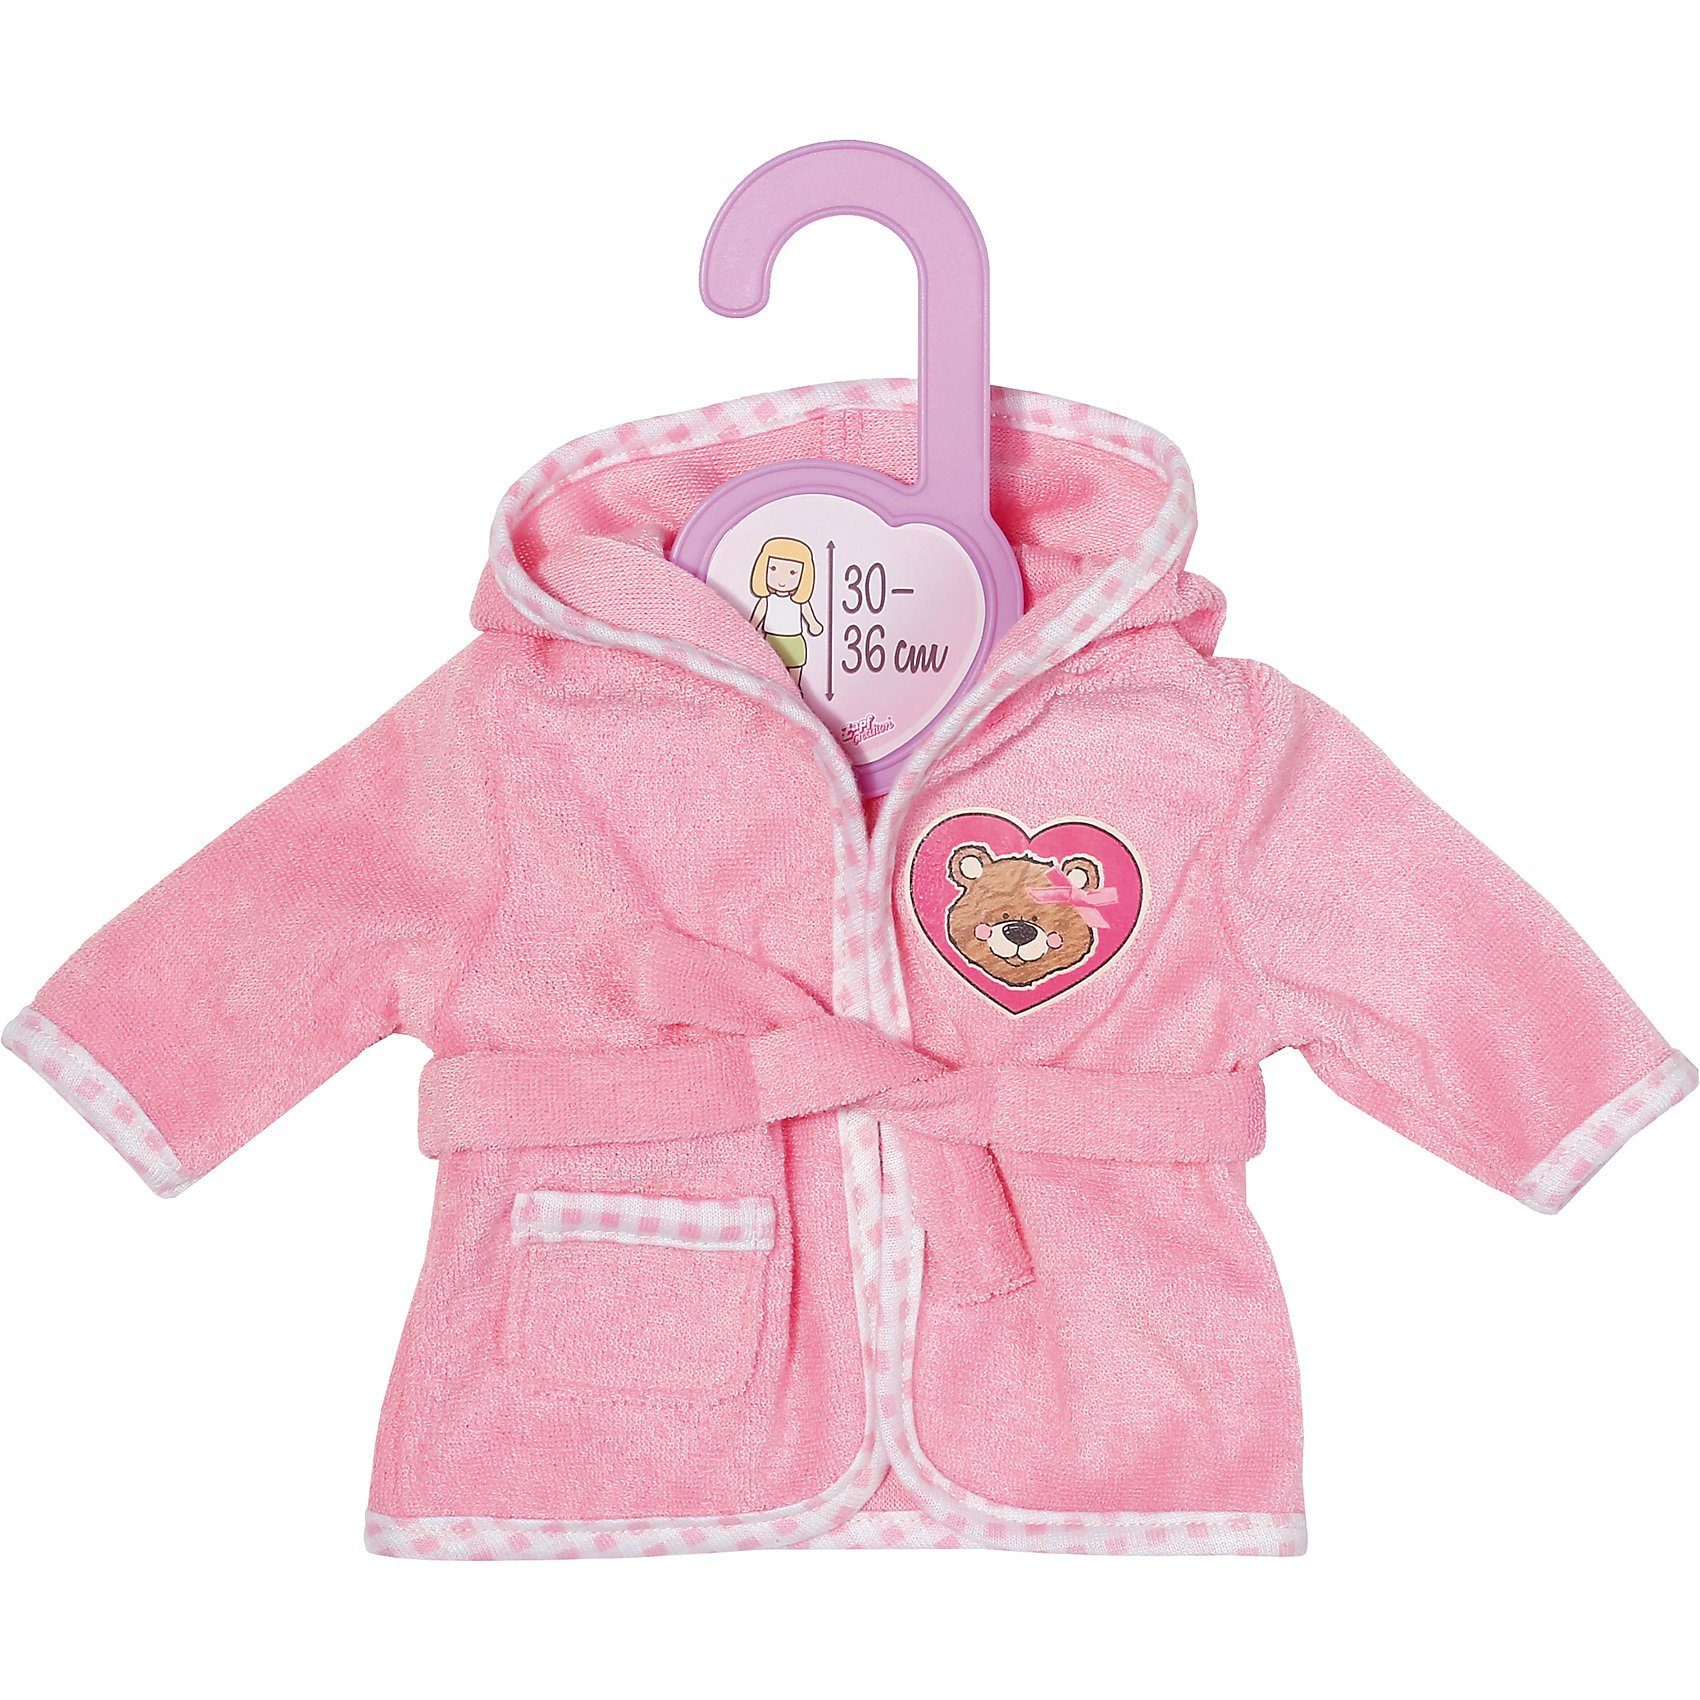 Zapf Creation® Dolly Moda Bademantel, 30-36 cm, Puppenkleidung